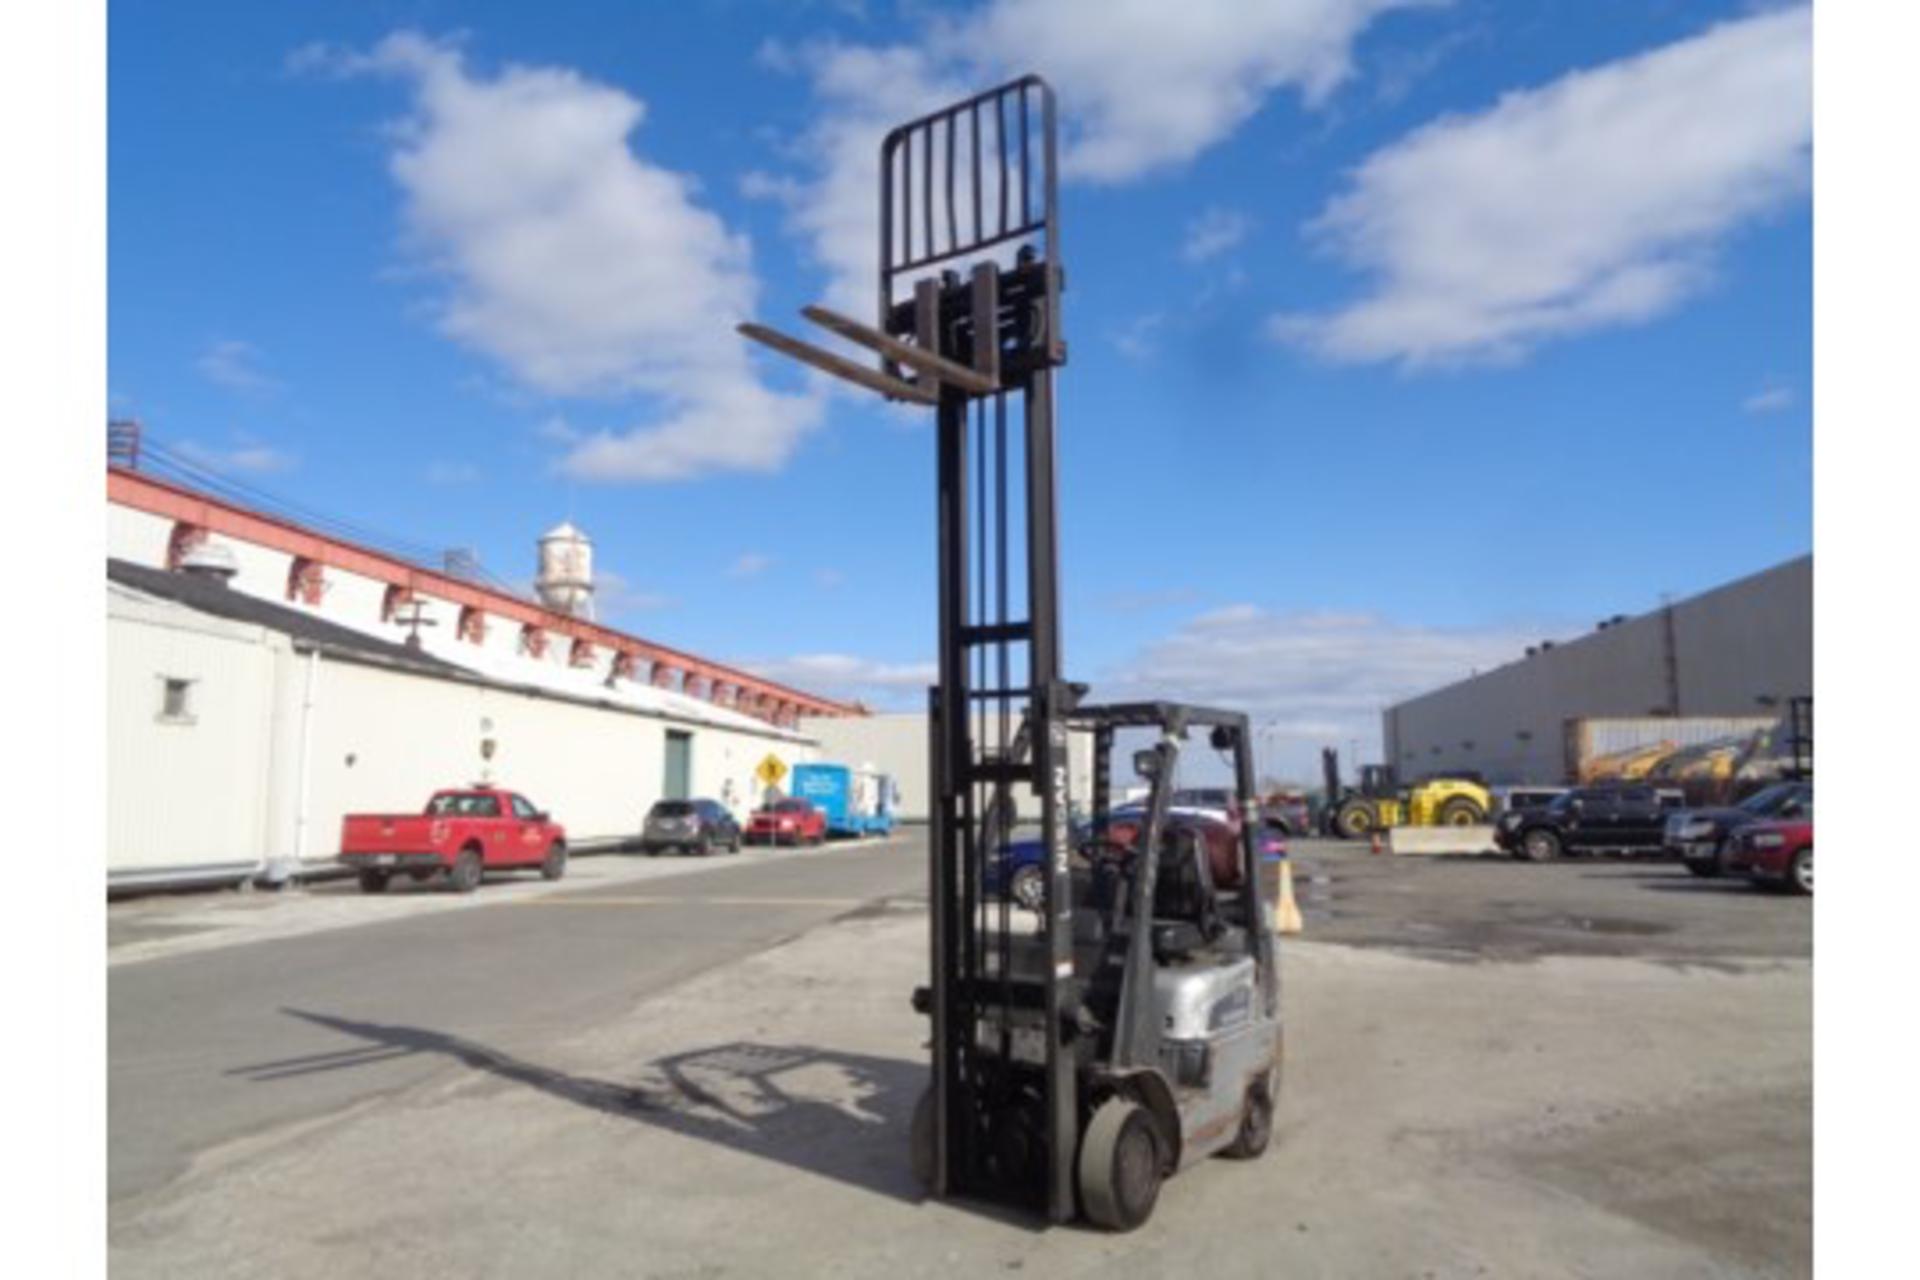 Nissan MCPL01A18LV 3500lb Forklift - Image 10 of 16